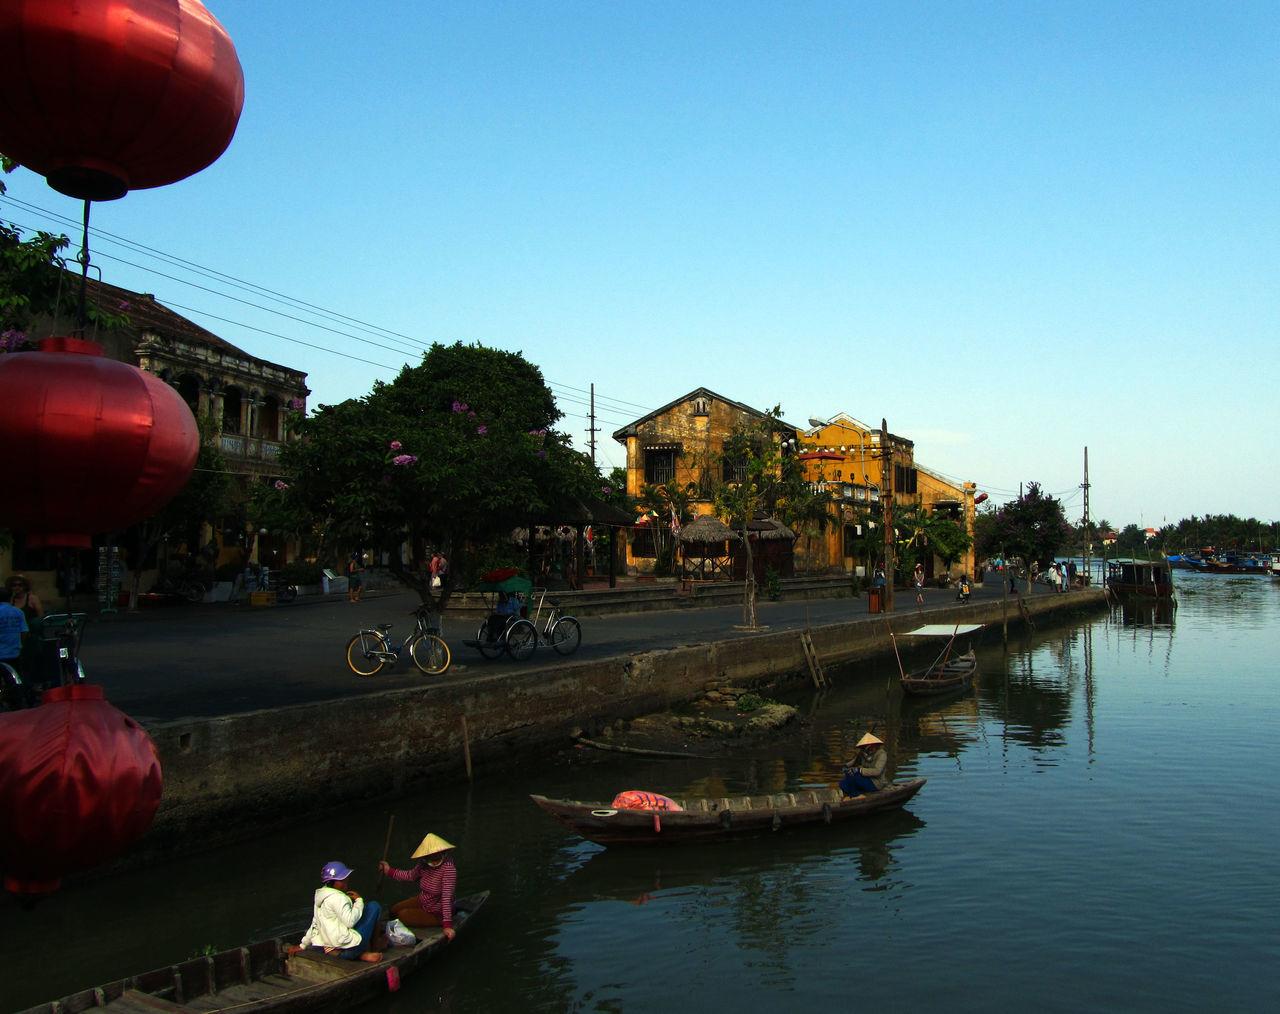 Boat Dusk Hoi An Lanterns River Travel Travel Photography Vietnam World